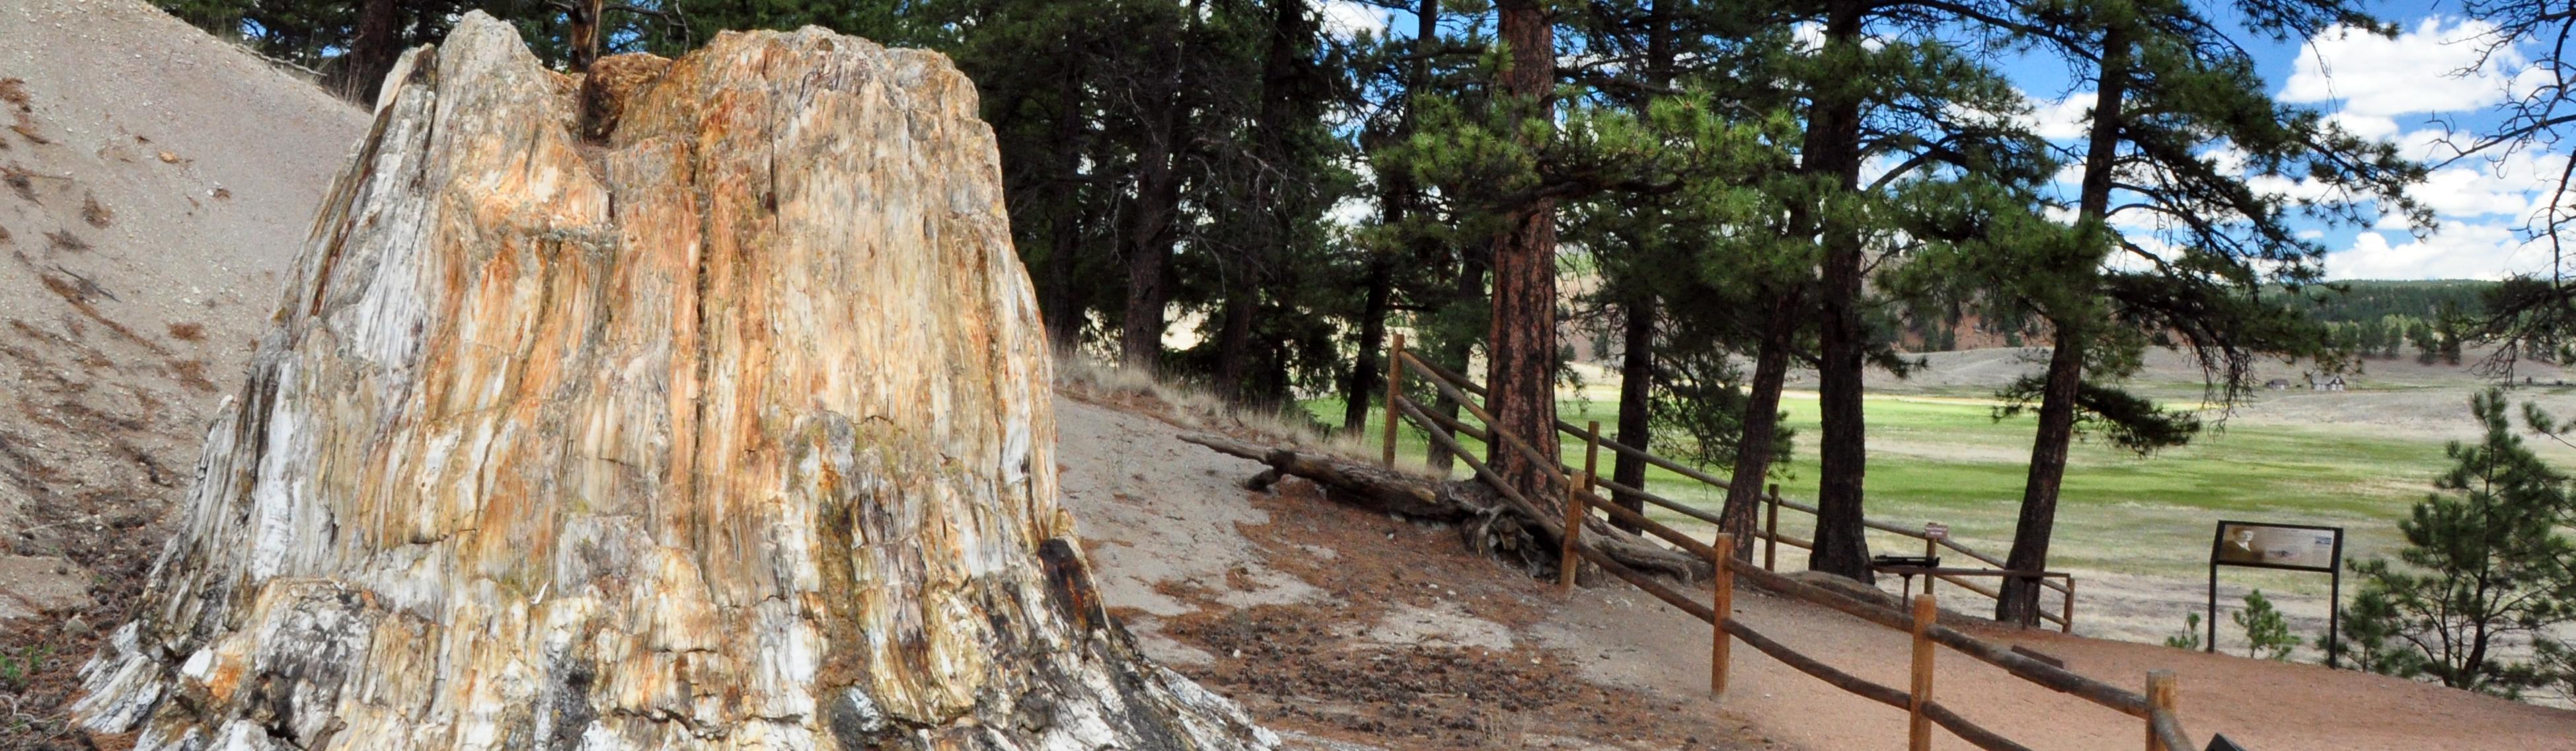 213b01a2f6fd Florissant Fossil Beds National Monument (U.S. National Park Service)